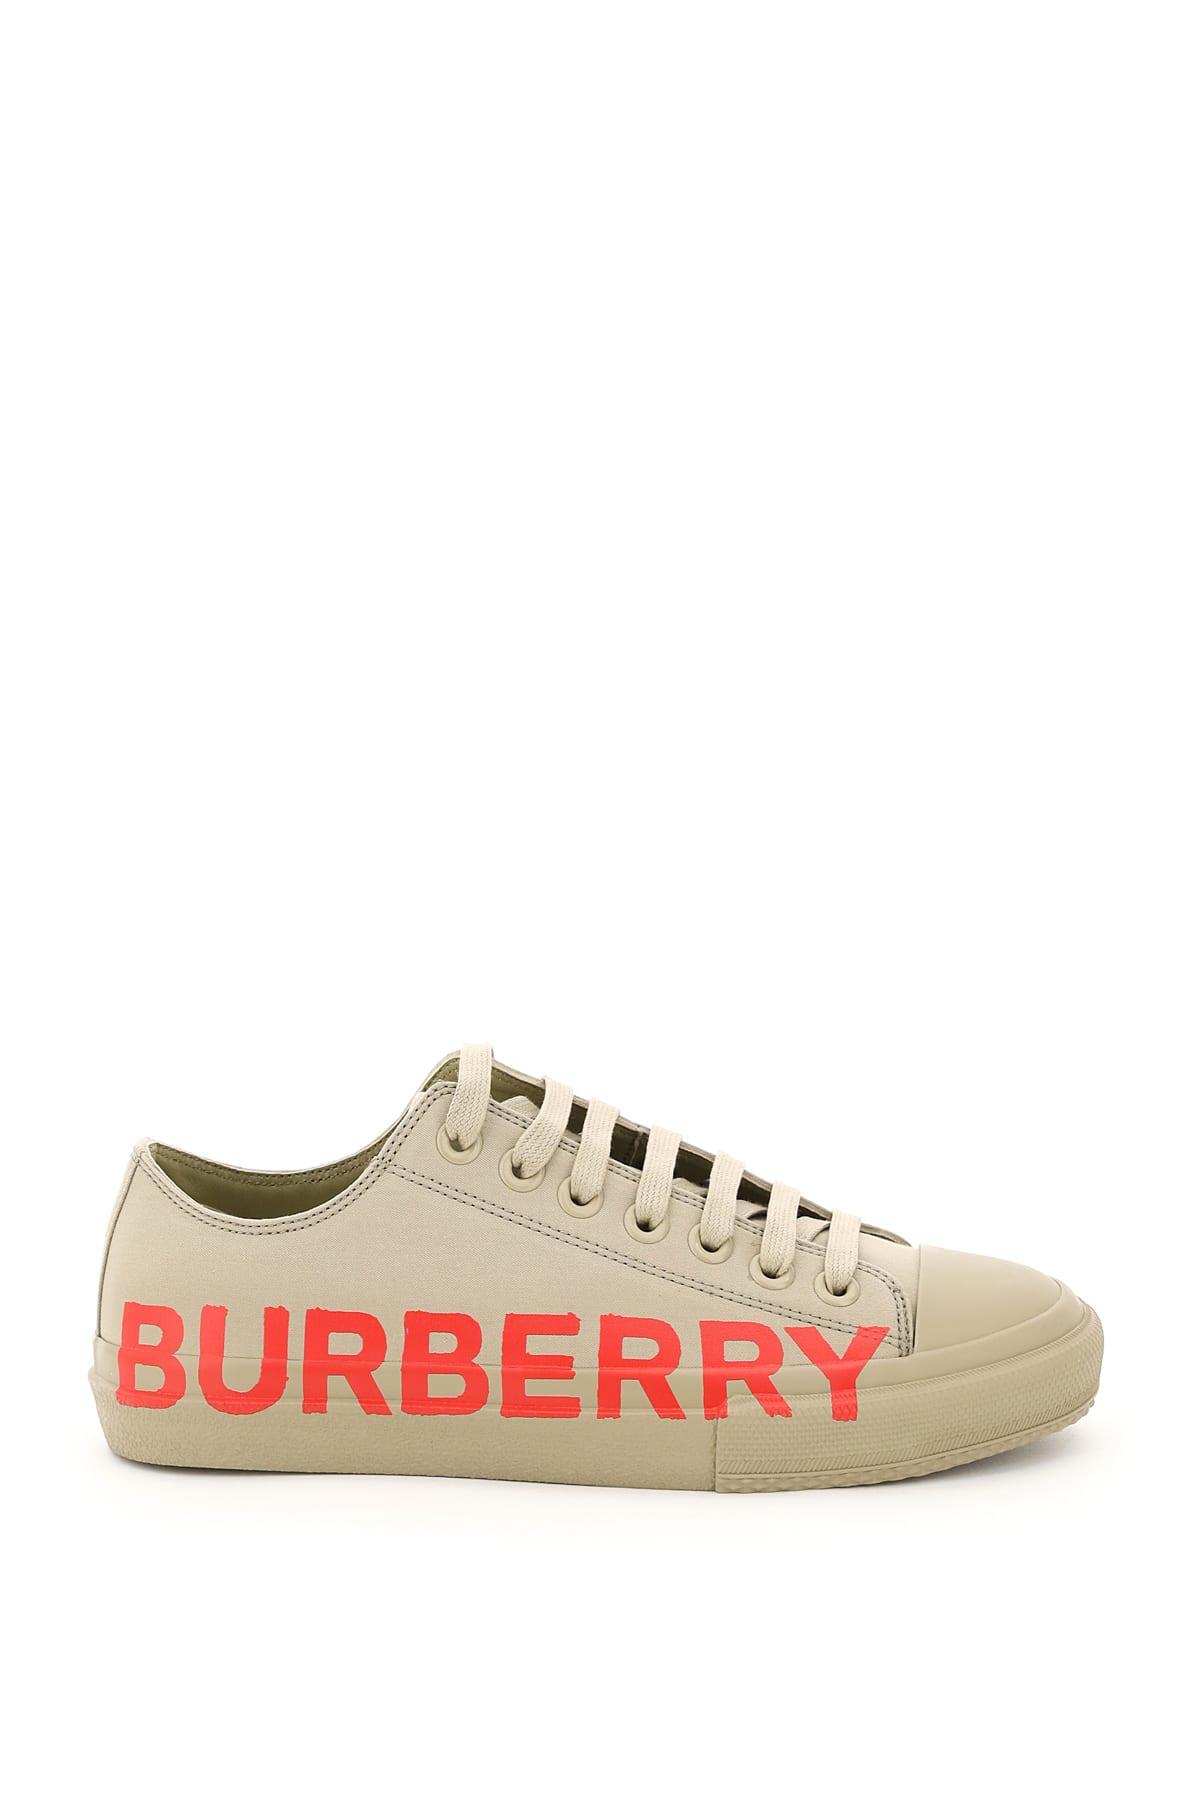 Burberry Shoes LARKHALL LOGO PRINT SNEAKERS